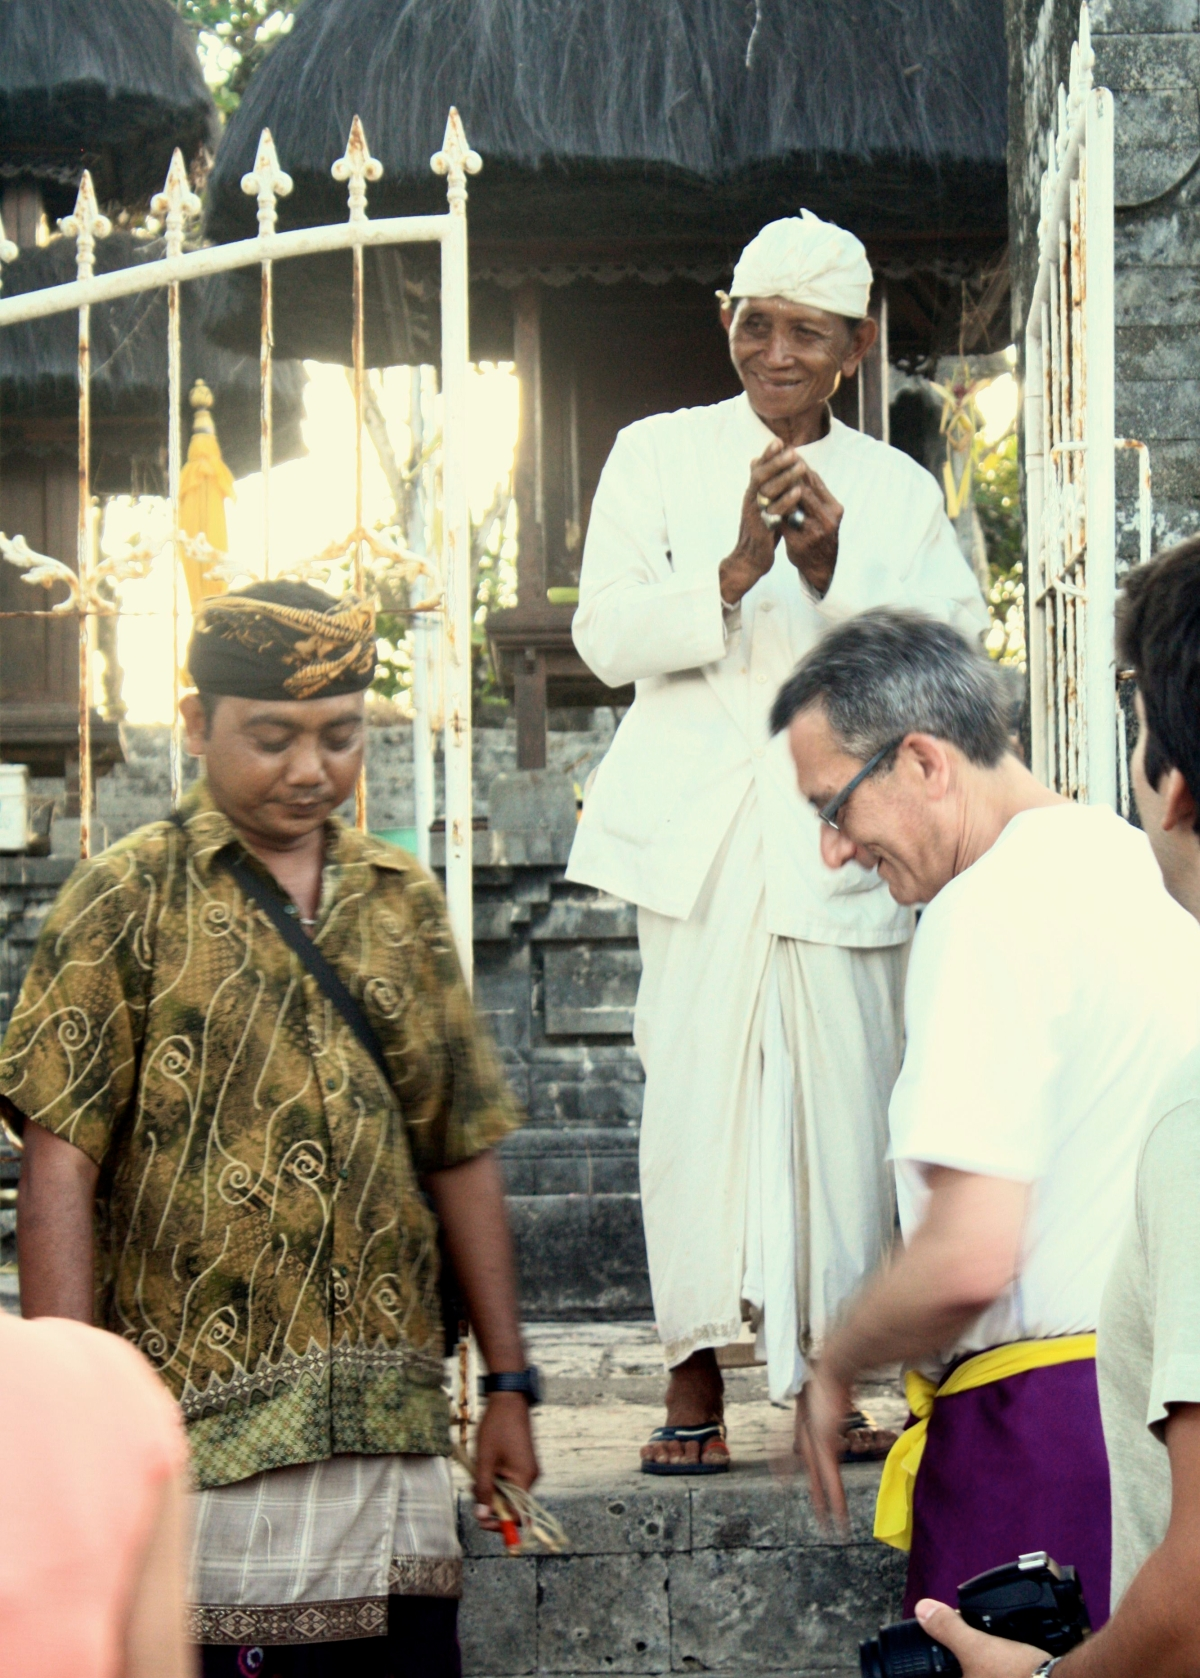 anth-receiving-a-hindu-blessing.jpg